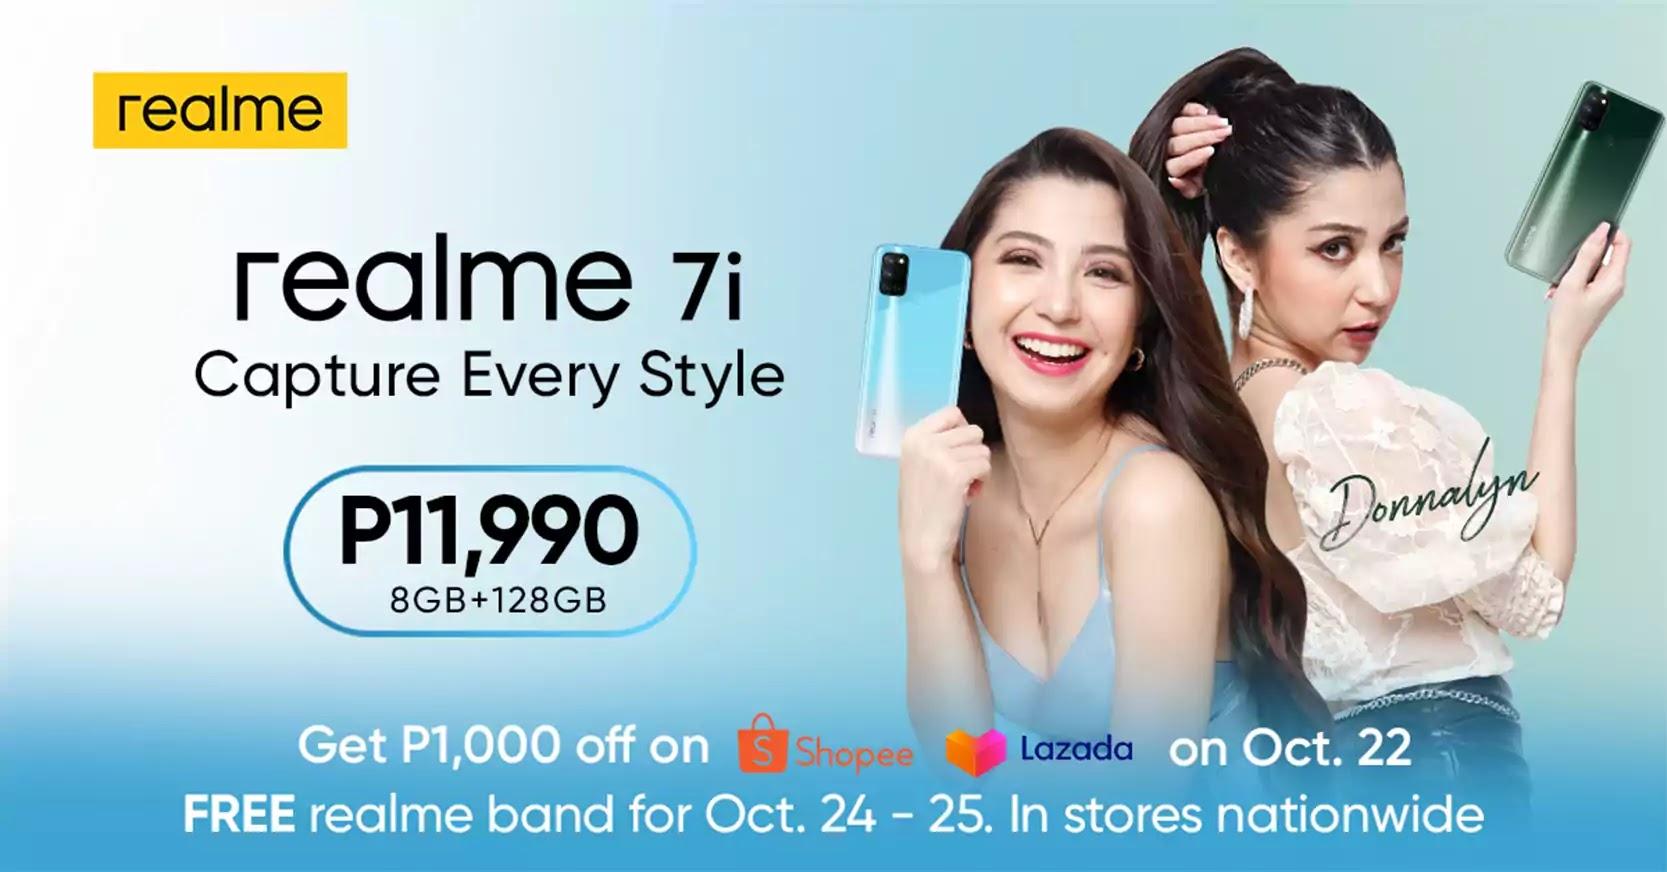 realme 7i Price and Availability